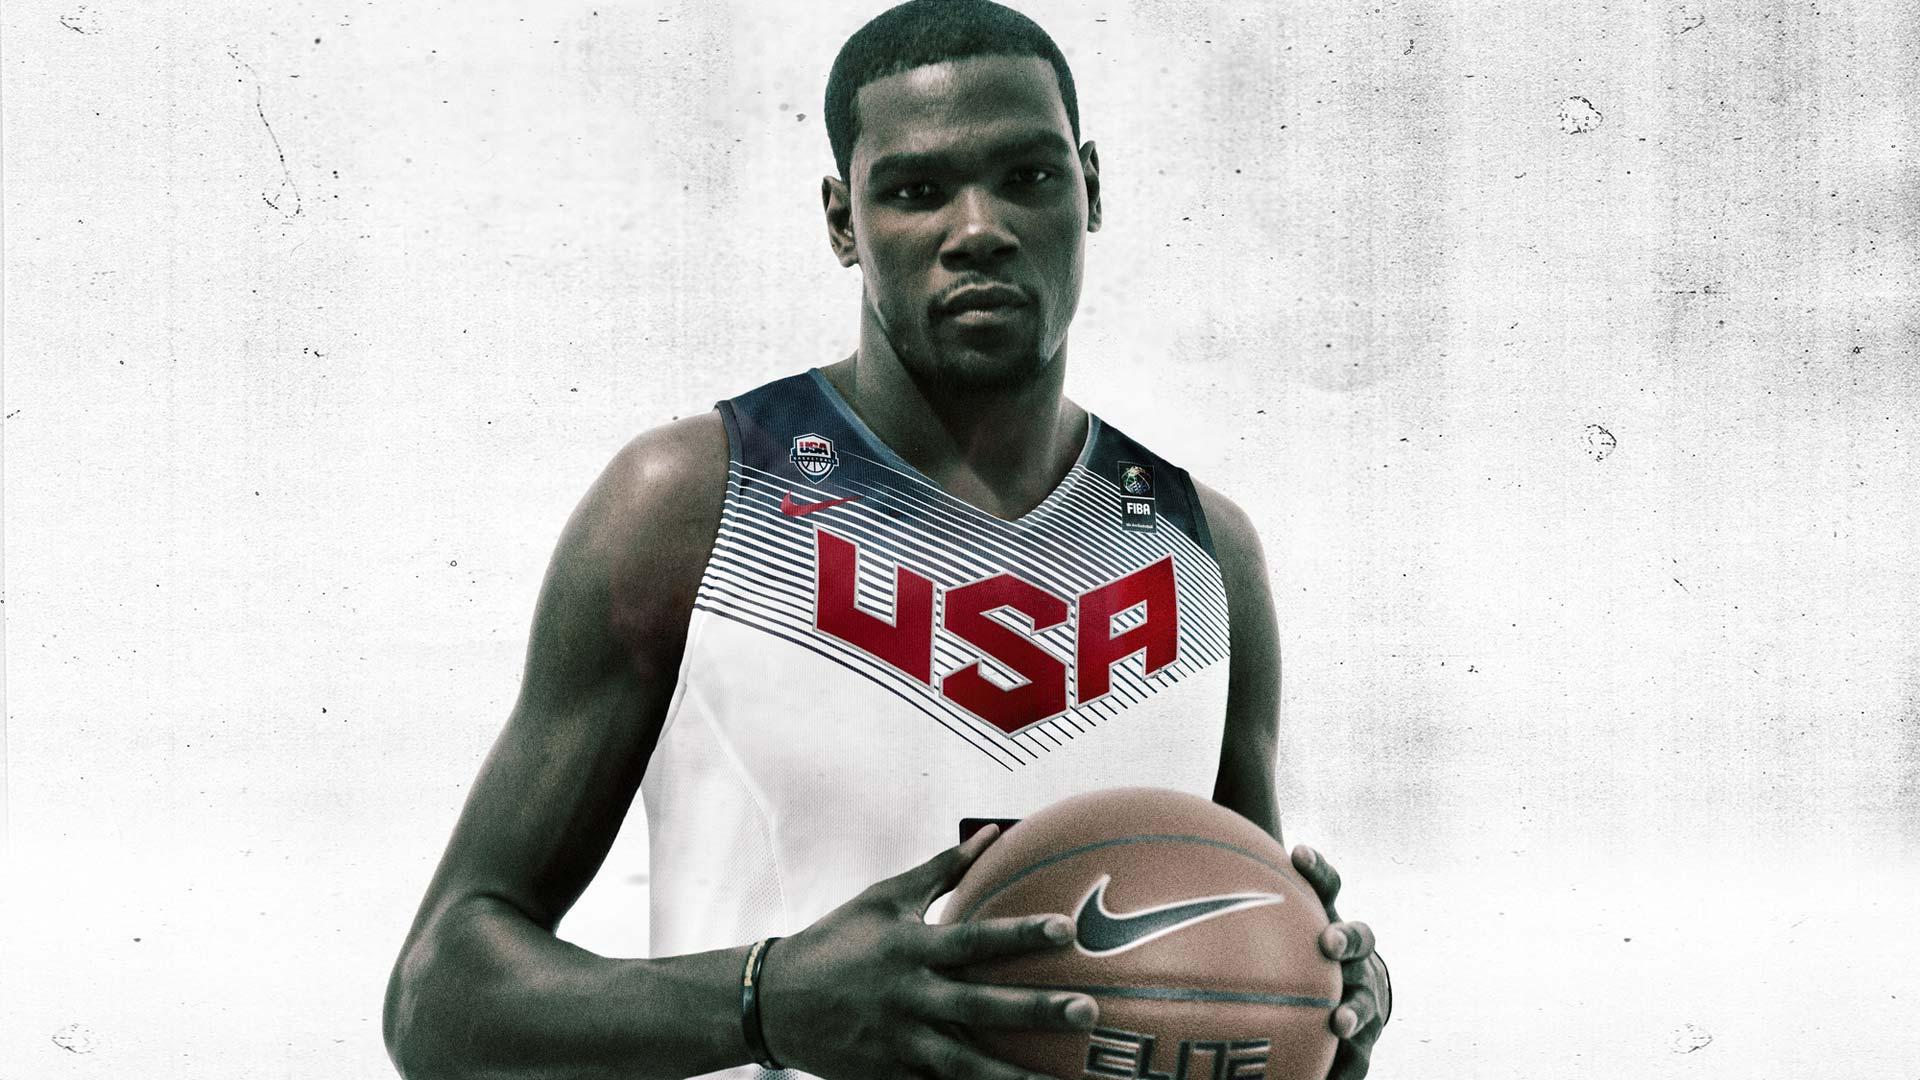 Kevin-Durant-080114-FTR-Nike.jpg